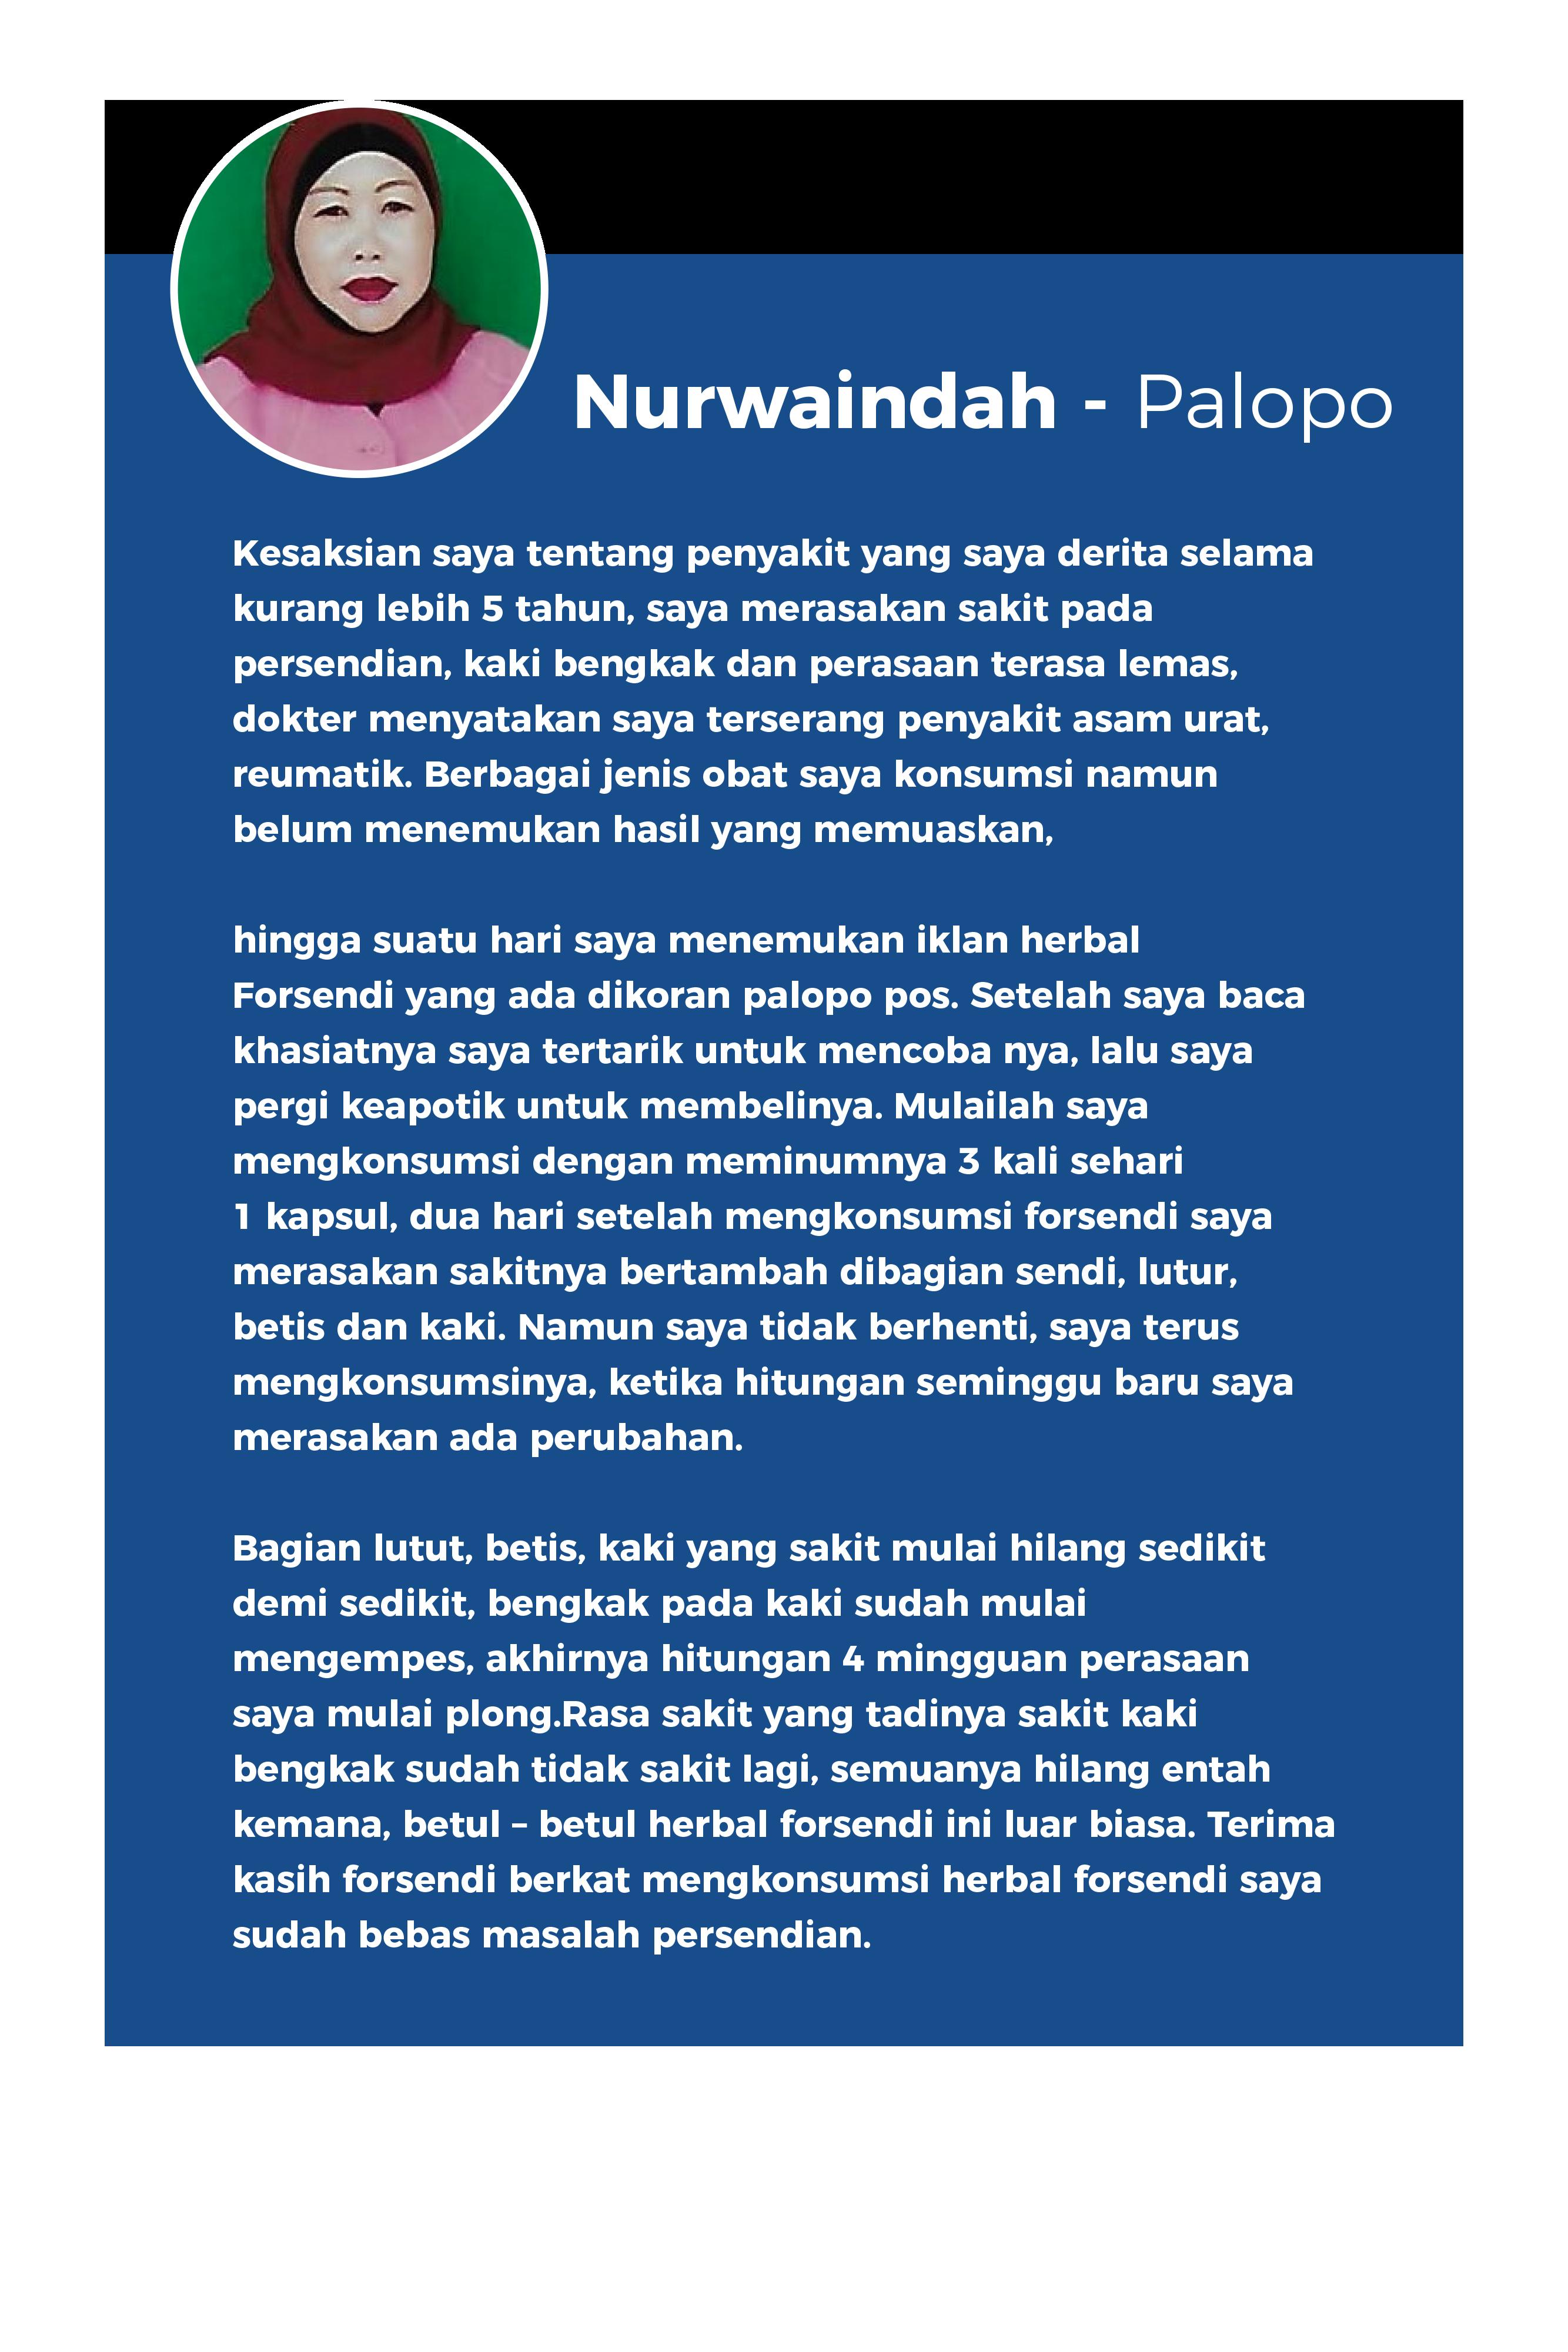 nurwaindah